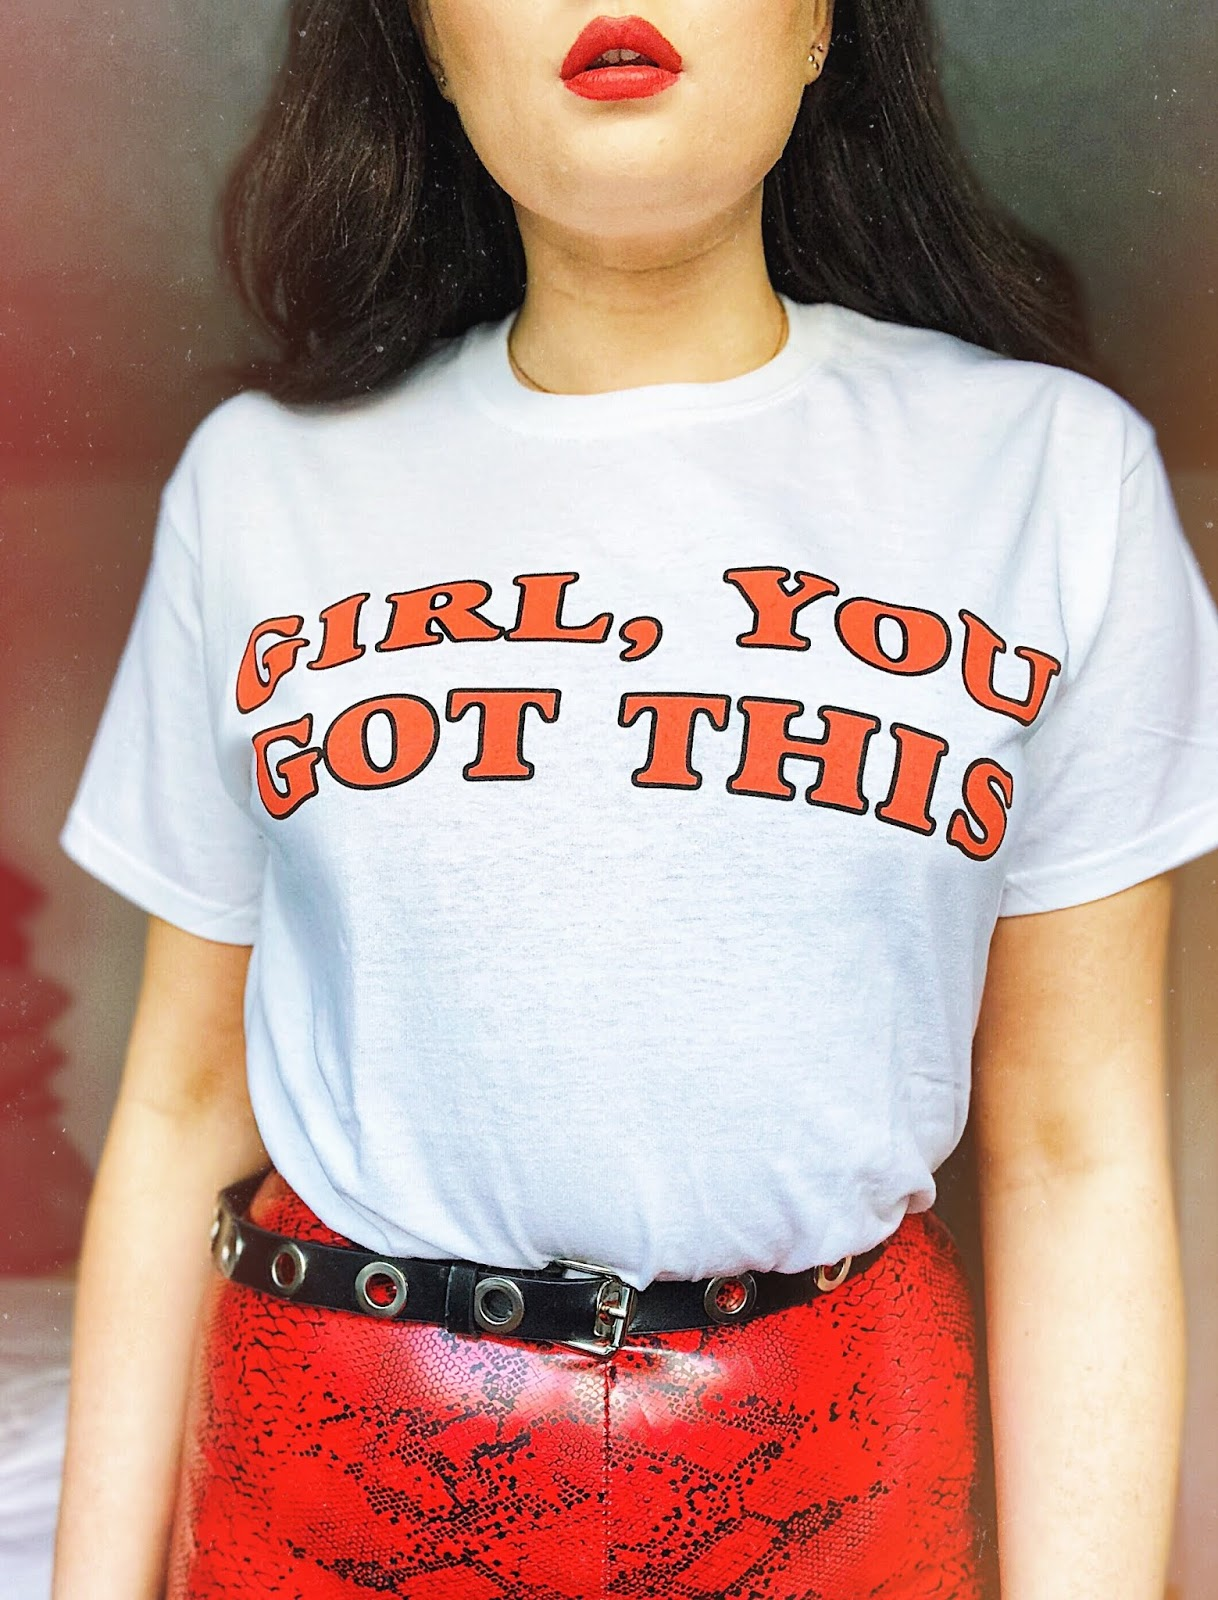 everybodyinplt, prettylittlething 2019, prettylittlething girl power, prettylittlething diversity, curve blogger, fashion blogger,